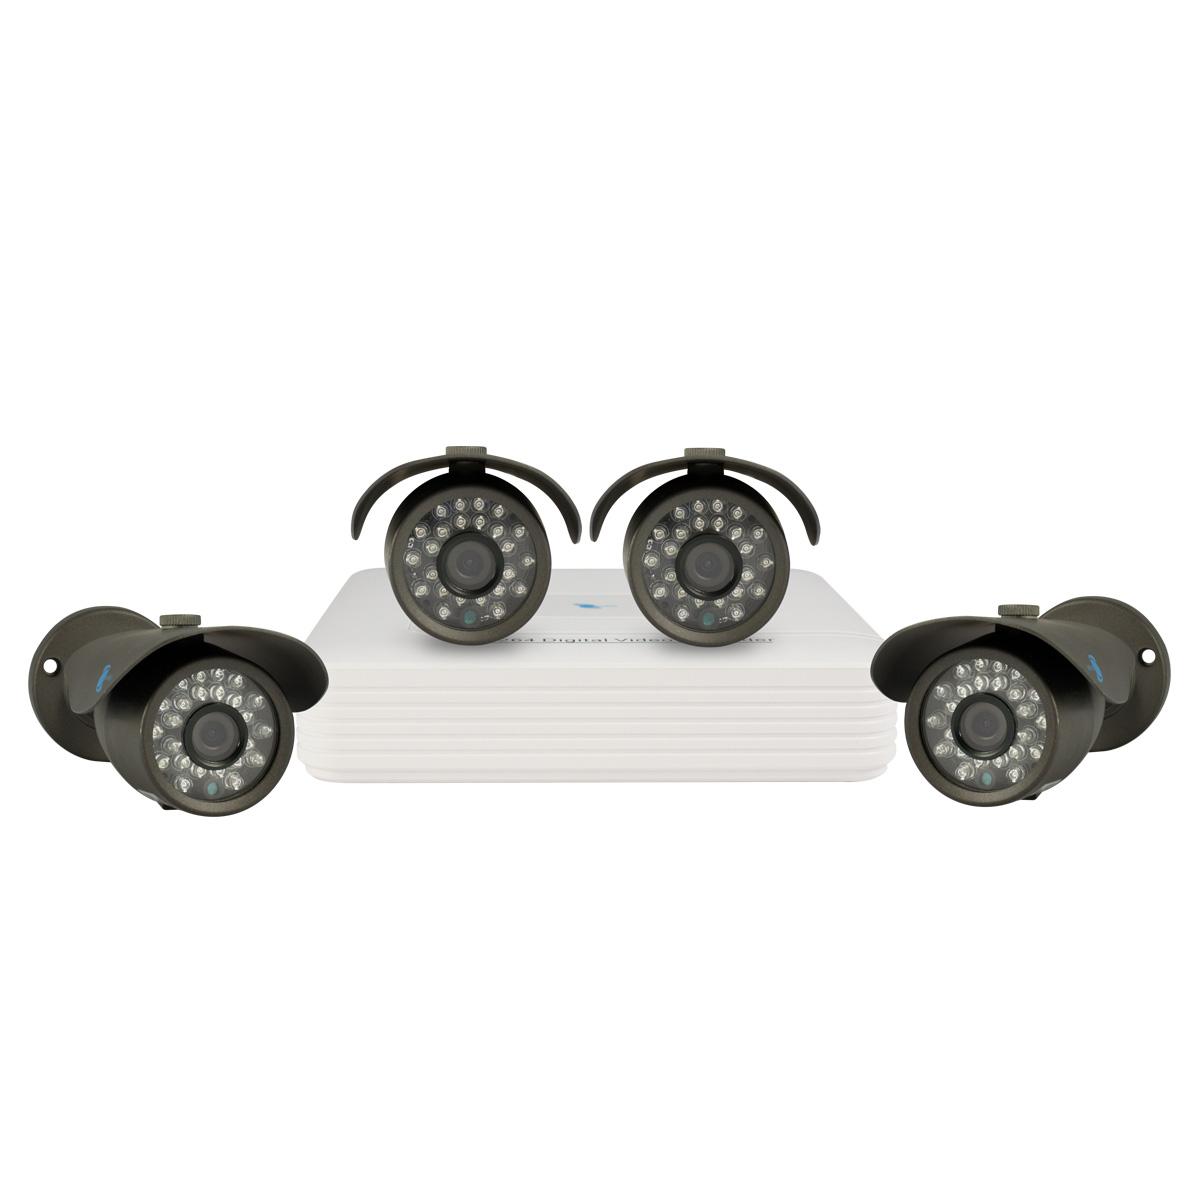 Kit of 4 cameras, SONY CCD Sensor, 700TVL, OSD menu, H264/G711A, D1